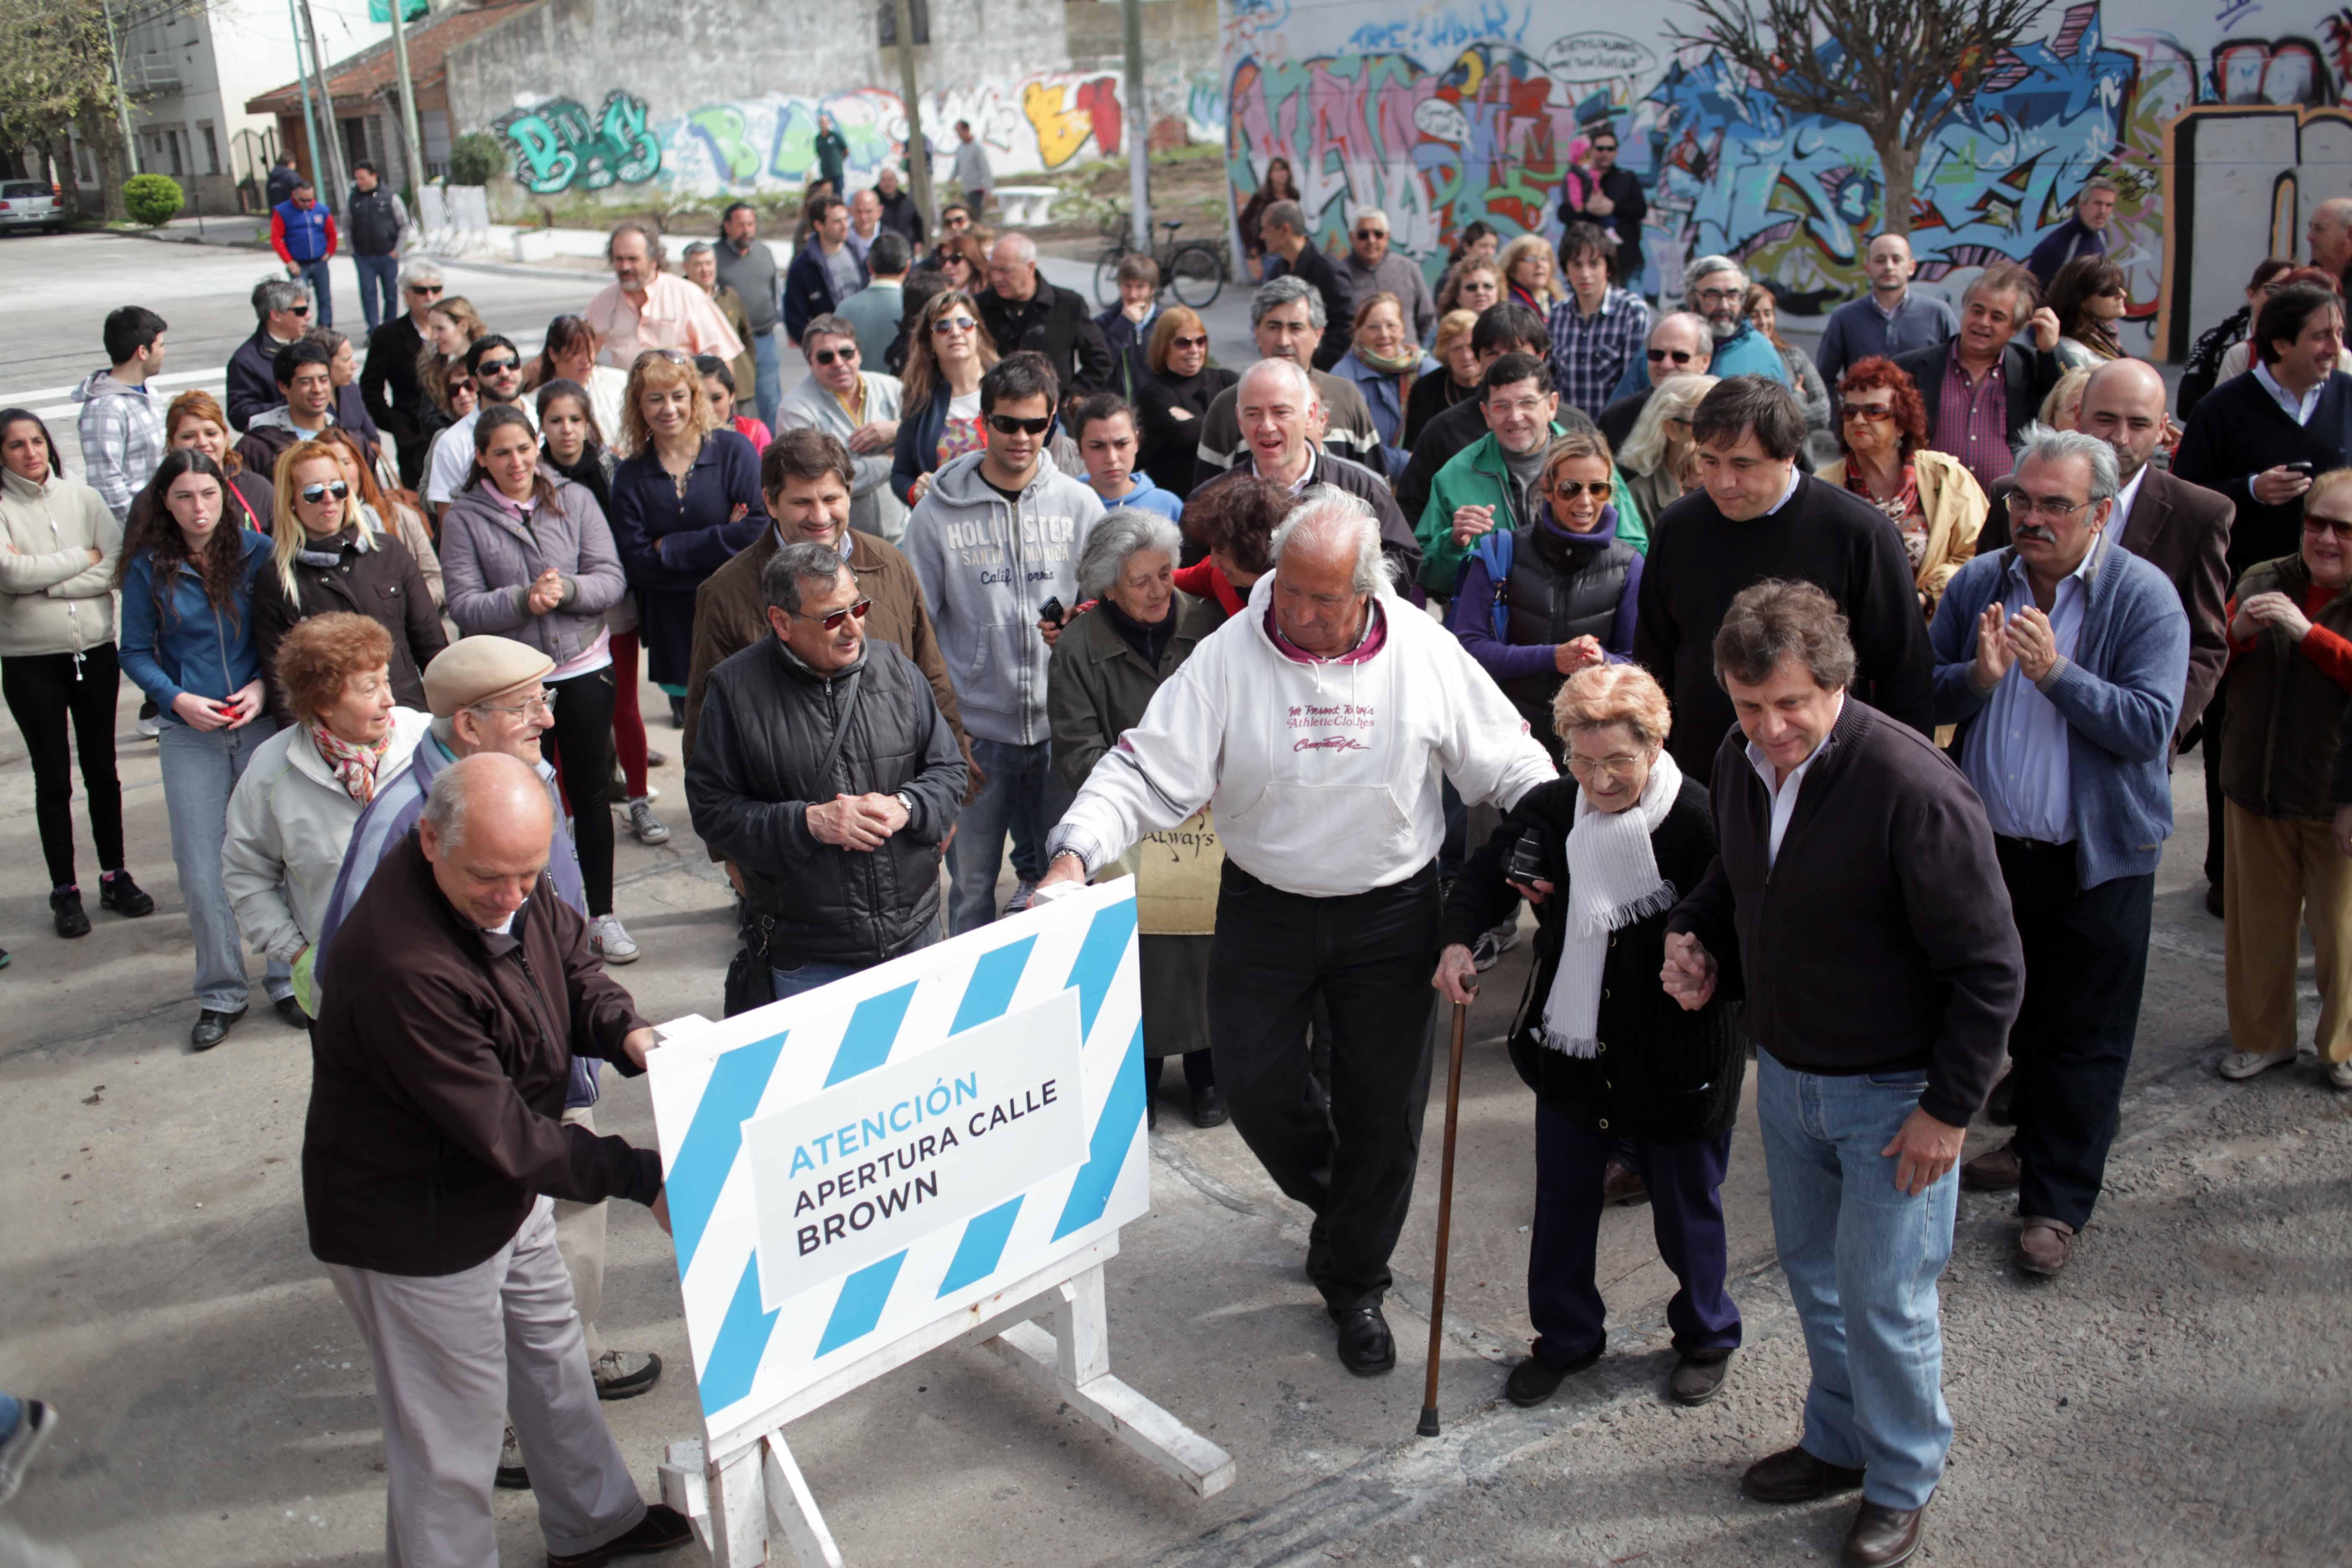 Foto MGP - EMVIAL - Apertura de calles Ferrocarril Brown